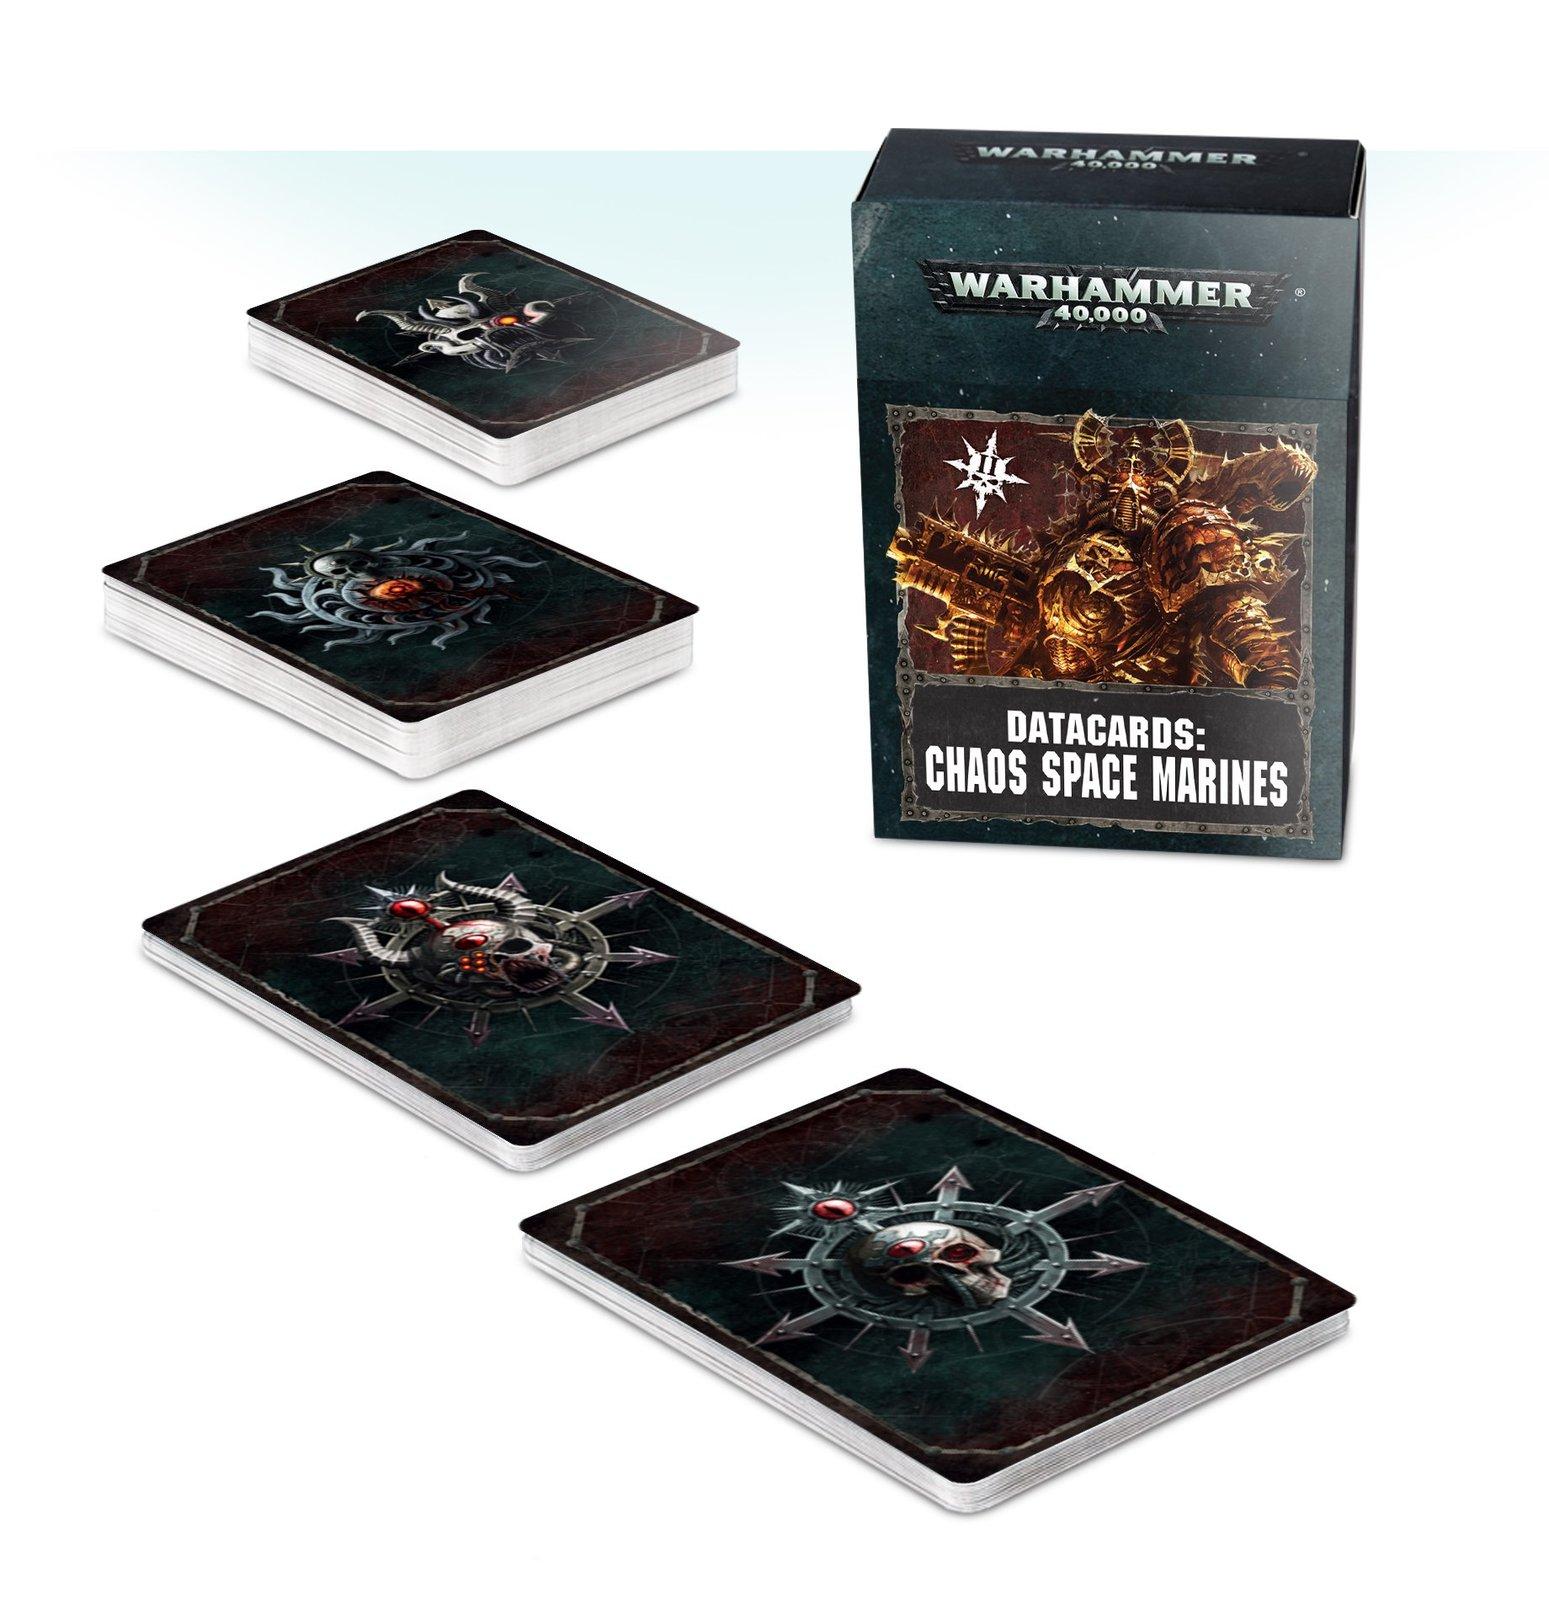 Warhammer 40,000 Datacards: Chaos Space Marines image